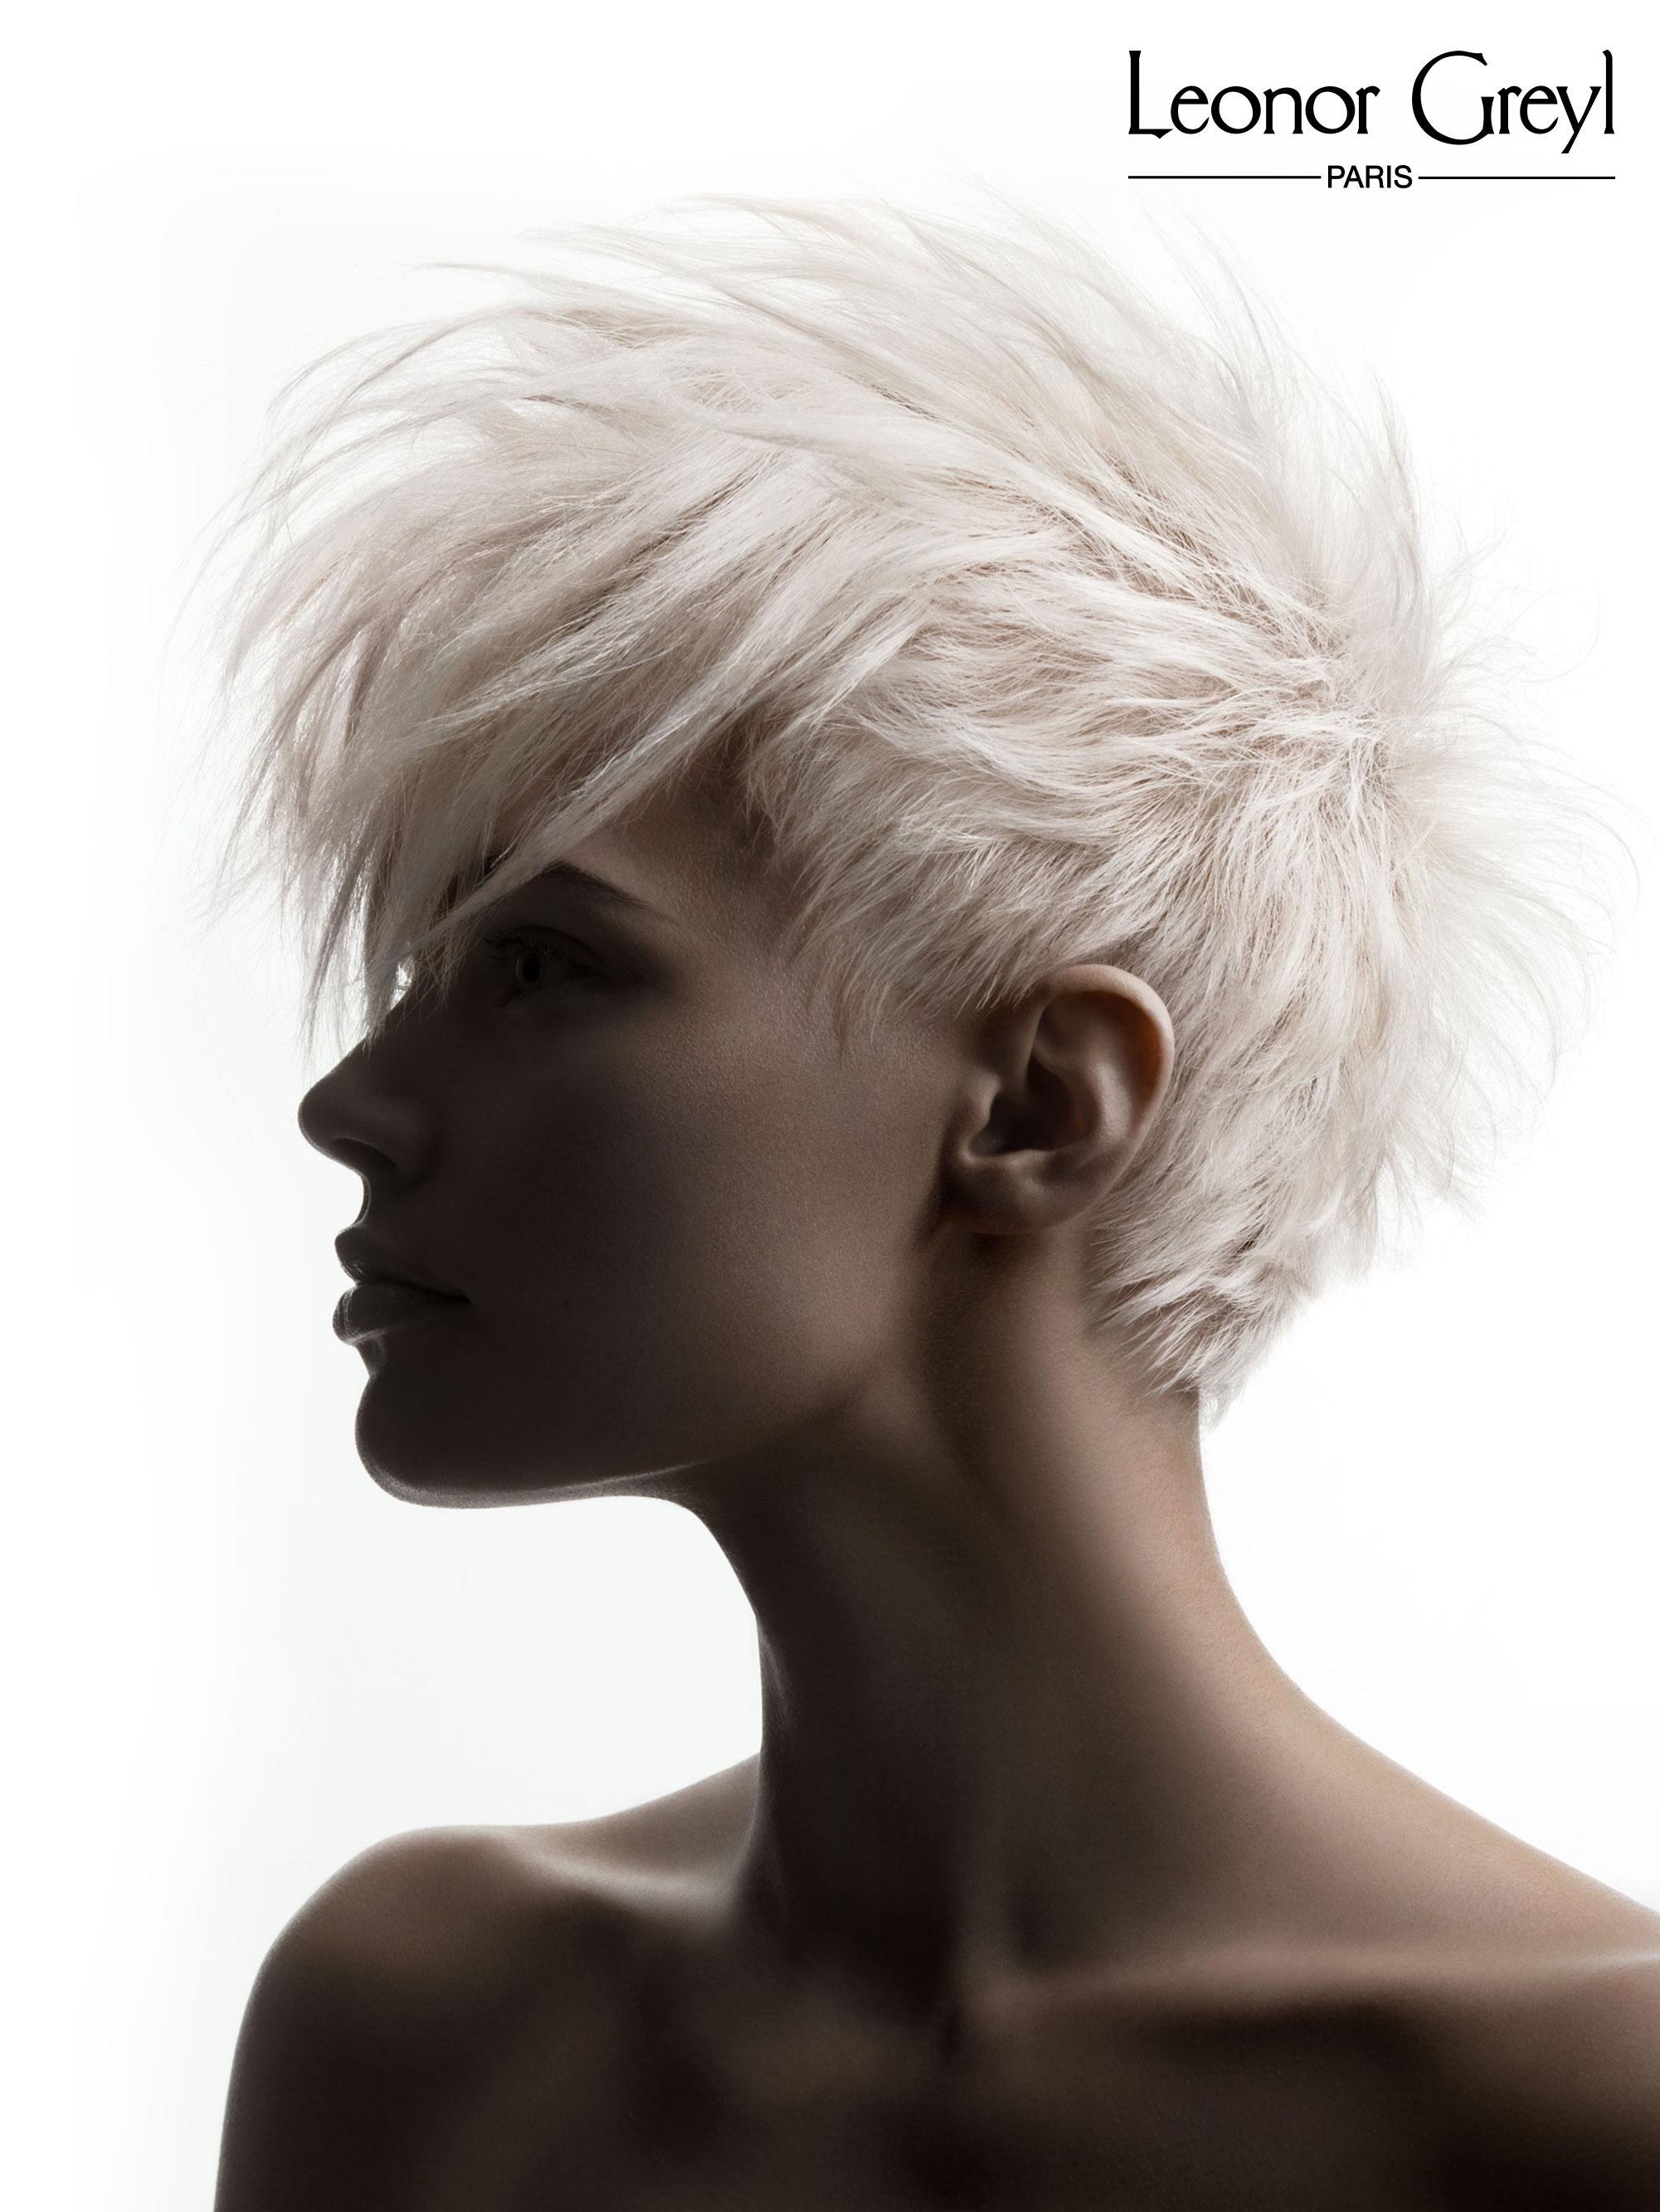 leonor-greyl-02_blond-dejaunissant